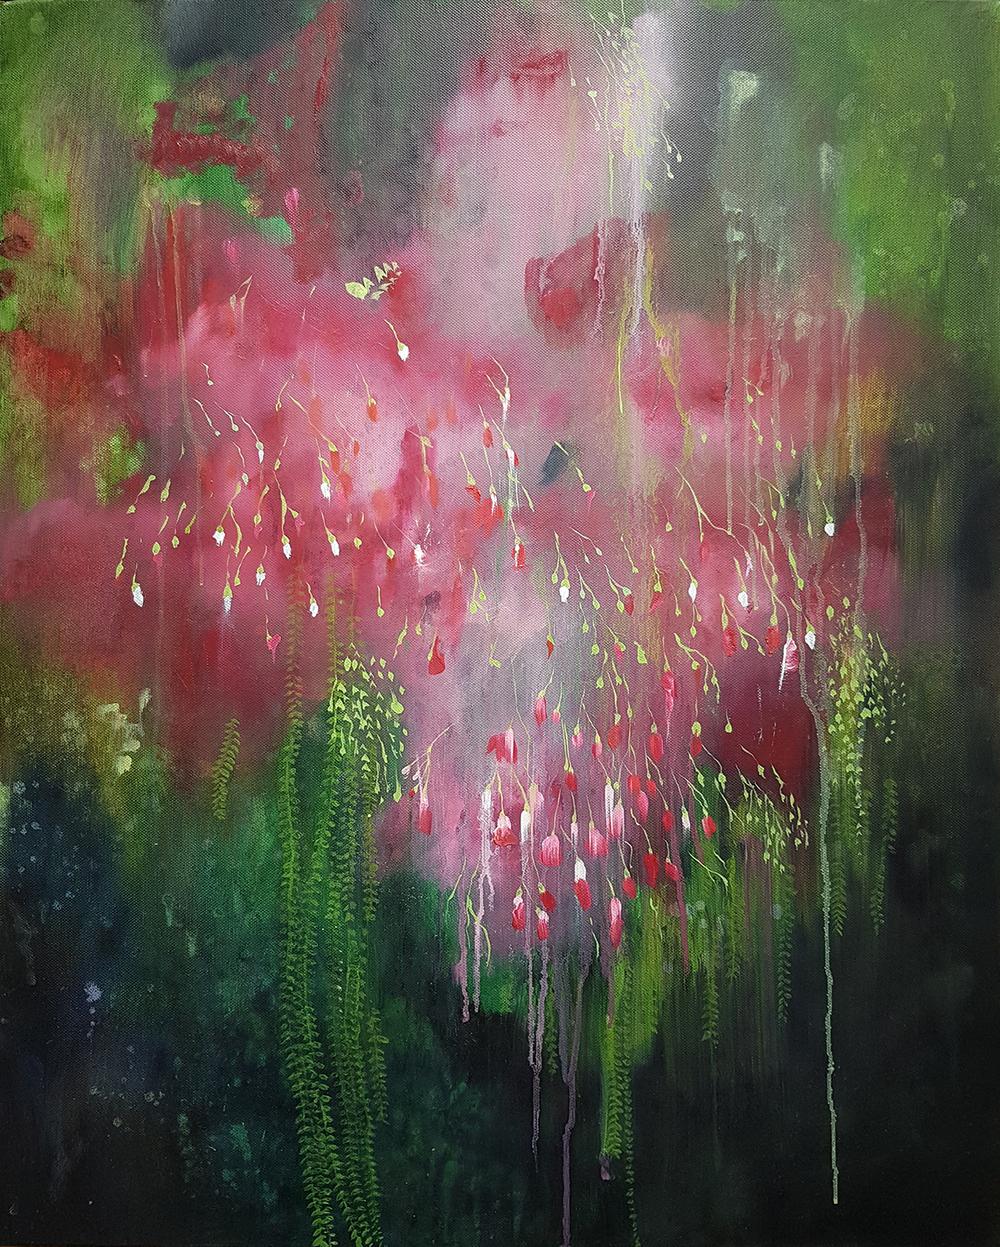 Katrine Claassens  'Night Garden'  Oil on board  76 x 60.5 cm